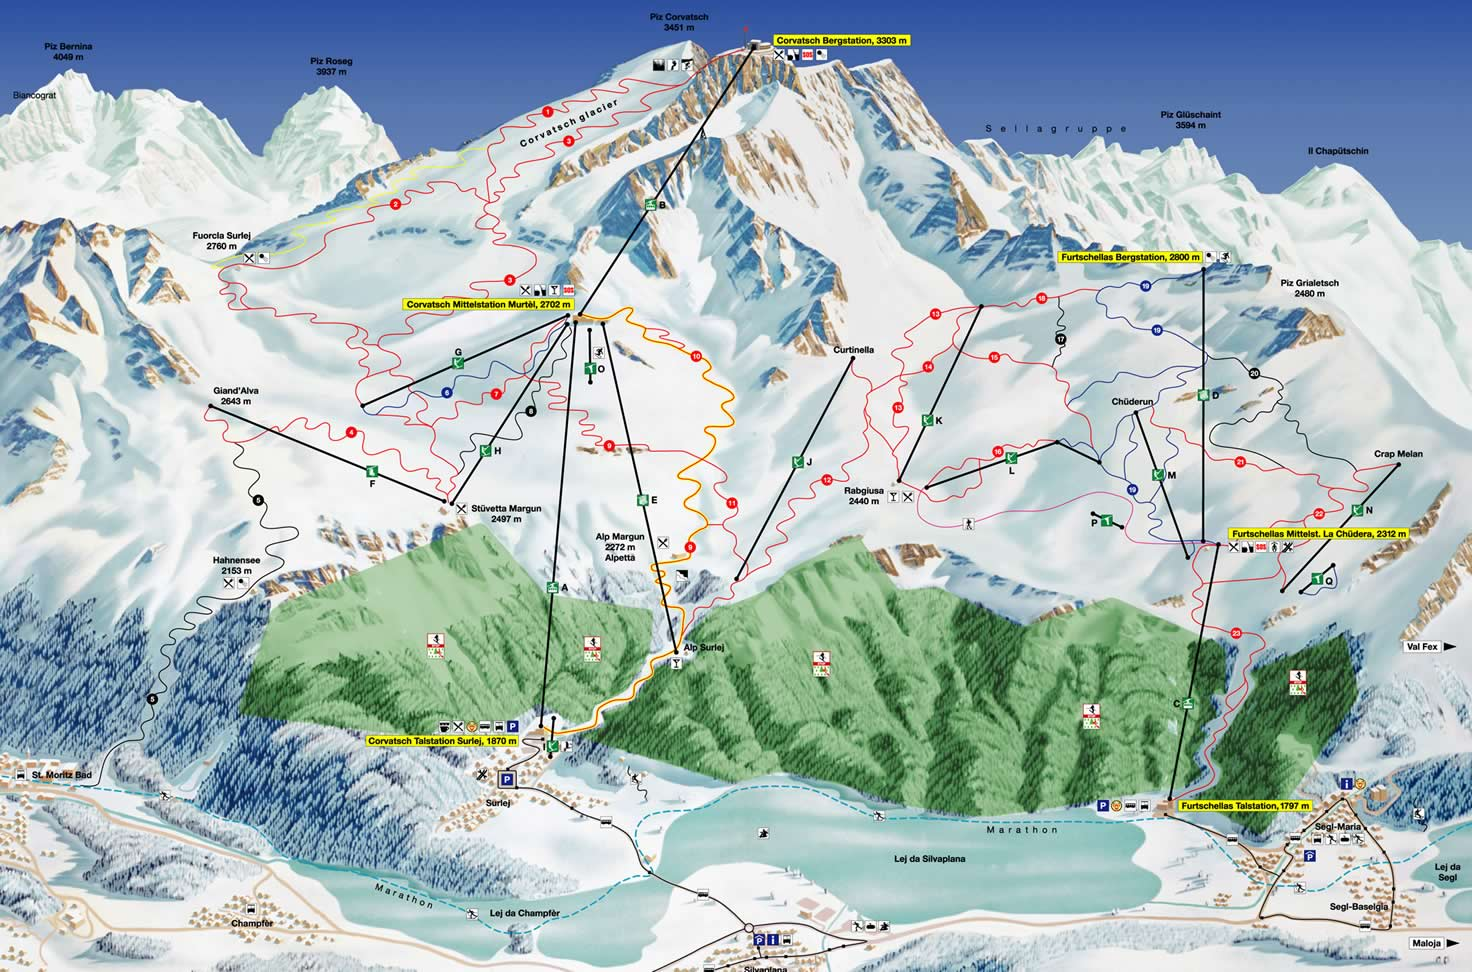 st_moritz_Corvatsch_ski_area_trail_map